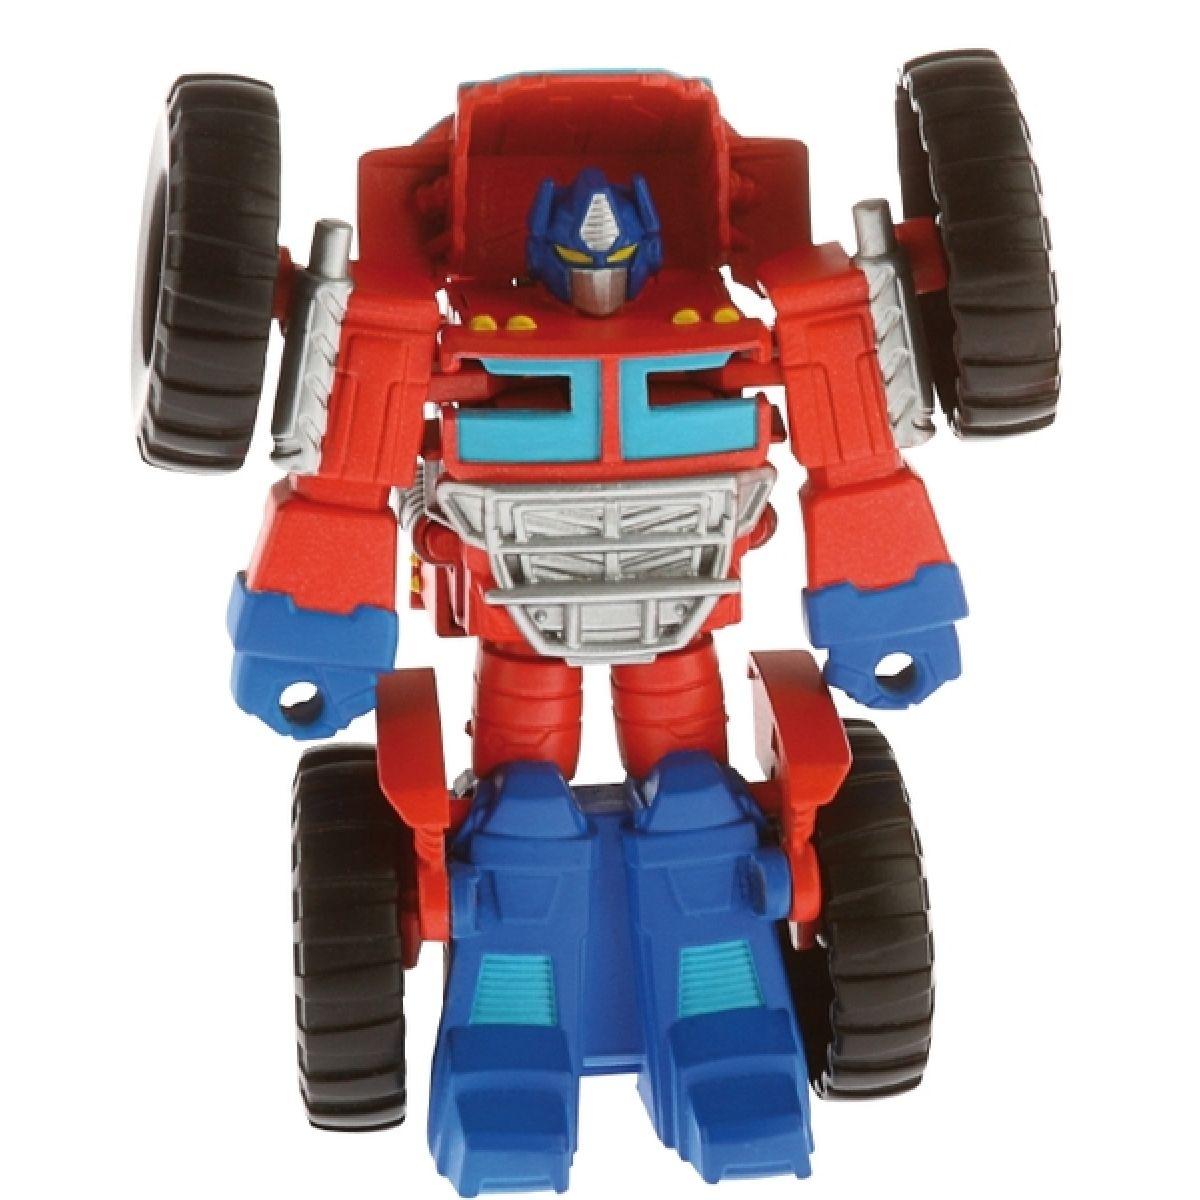 Transformers Rescude Dino-Bots figurka s dinosaurem - Optimus Prime